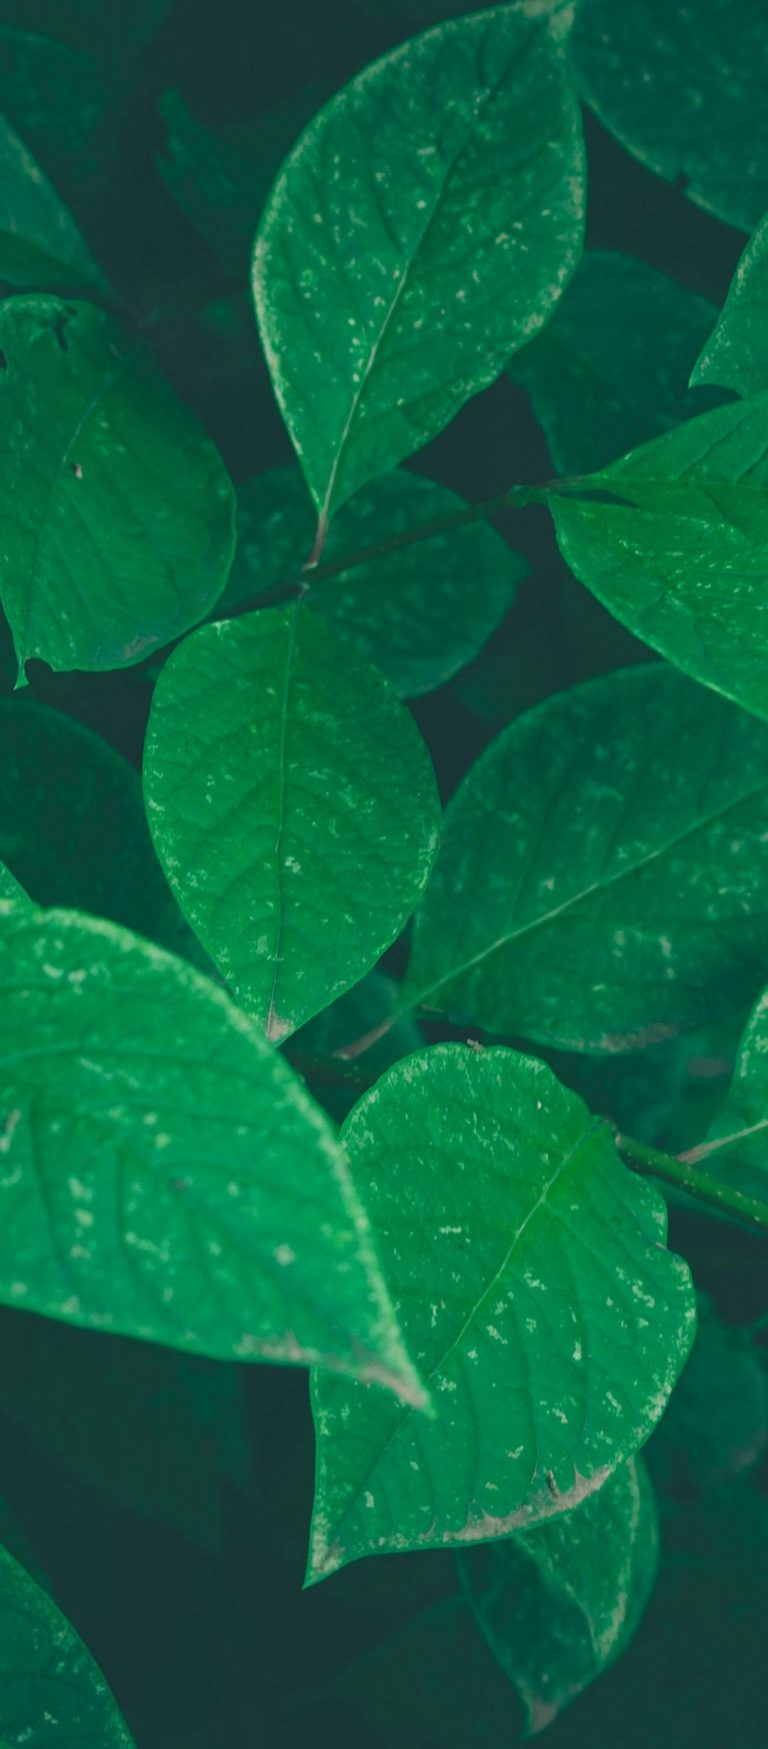 Bushes Leaves Herbs 1080x2460 768x1749